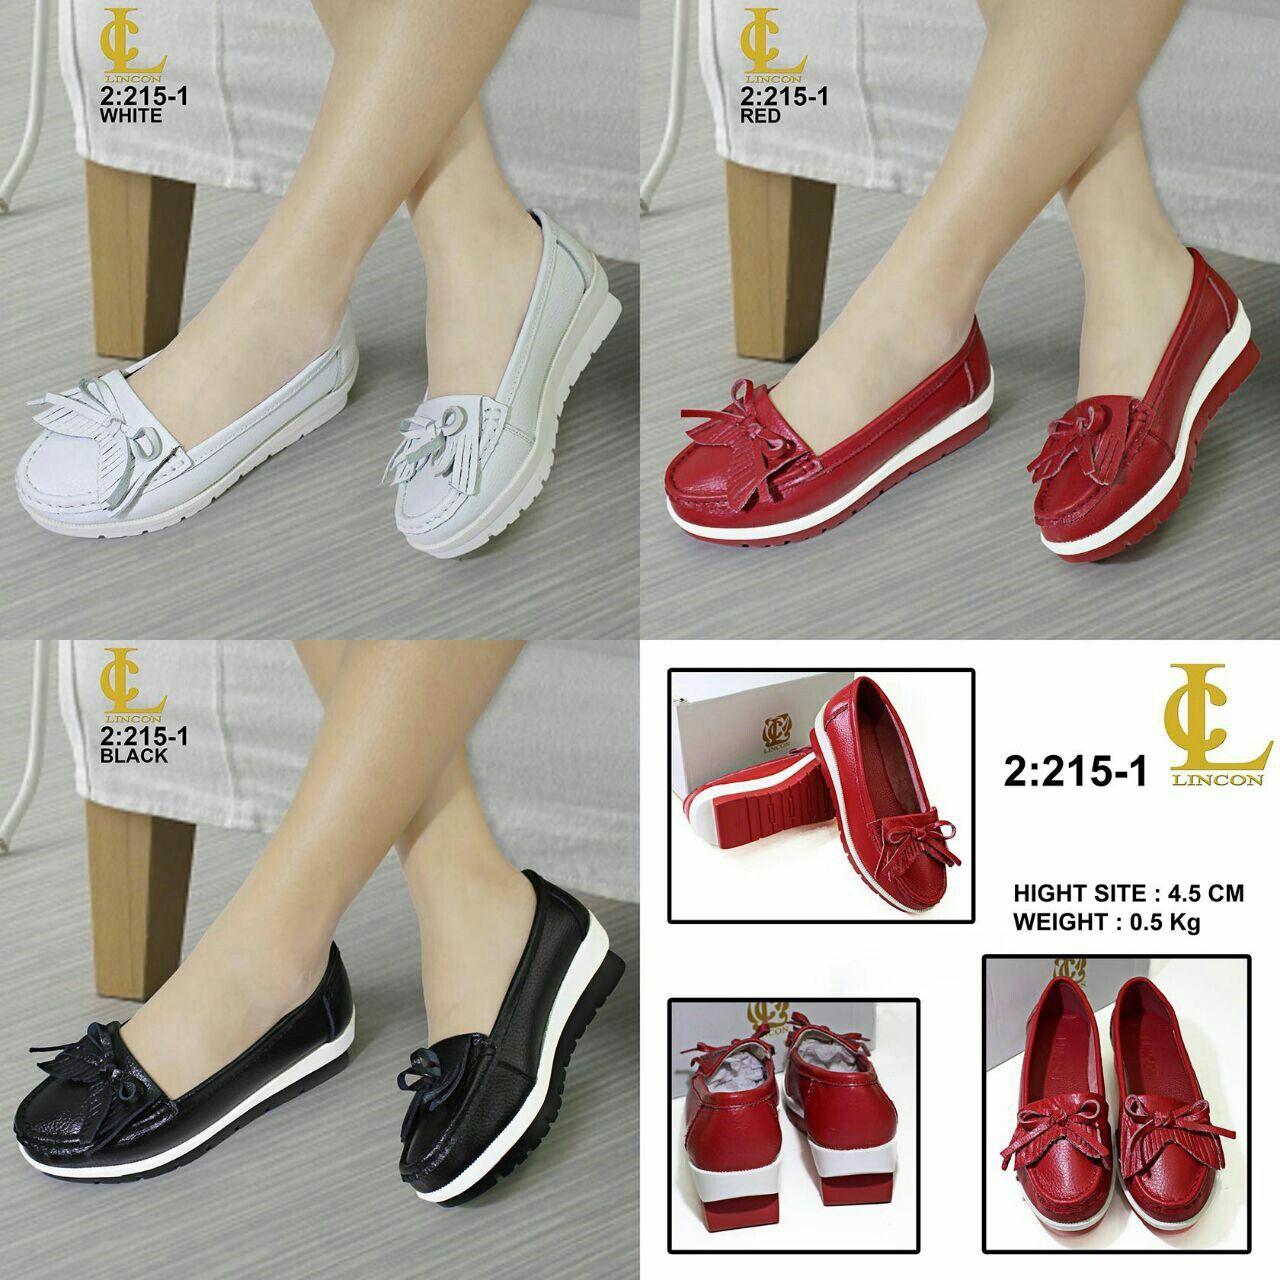 Sepatu Lincon 215 1 Original Brand Bahan Kulit Asli Hight Site 4